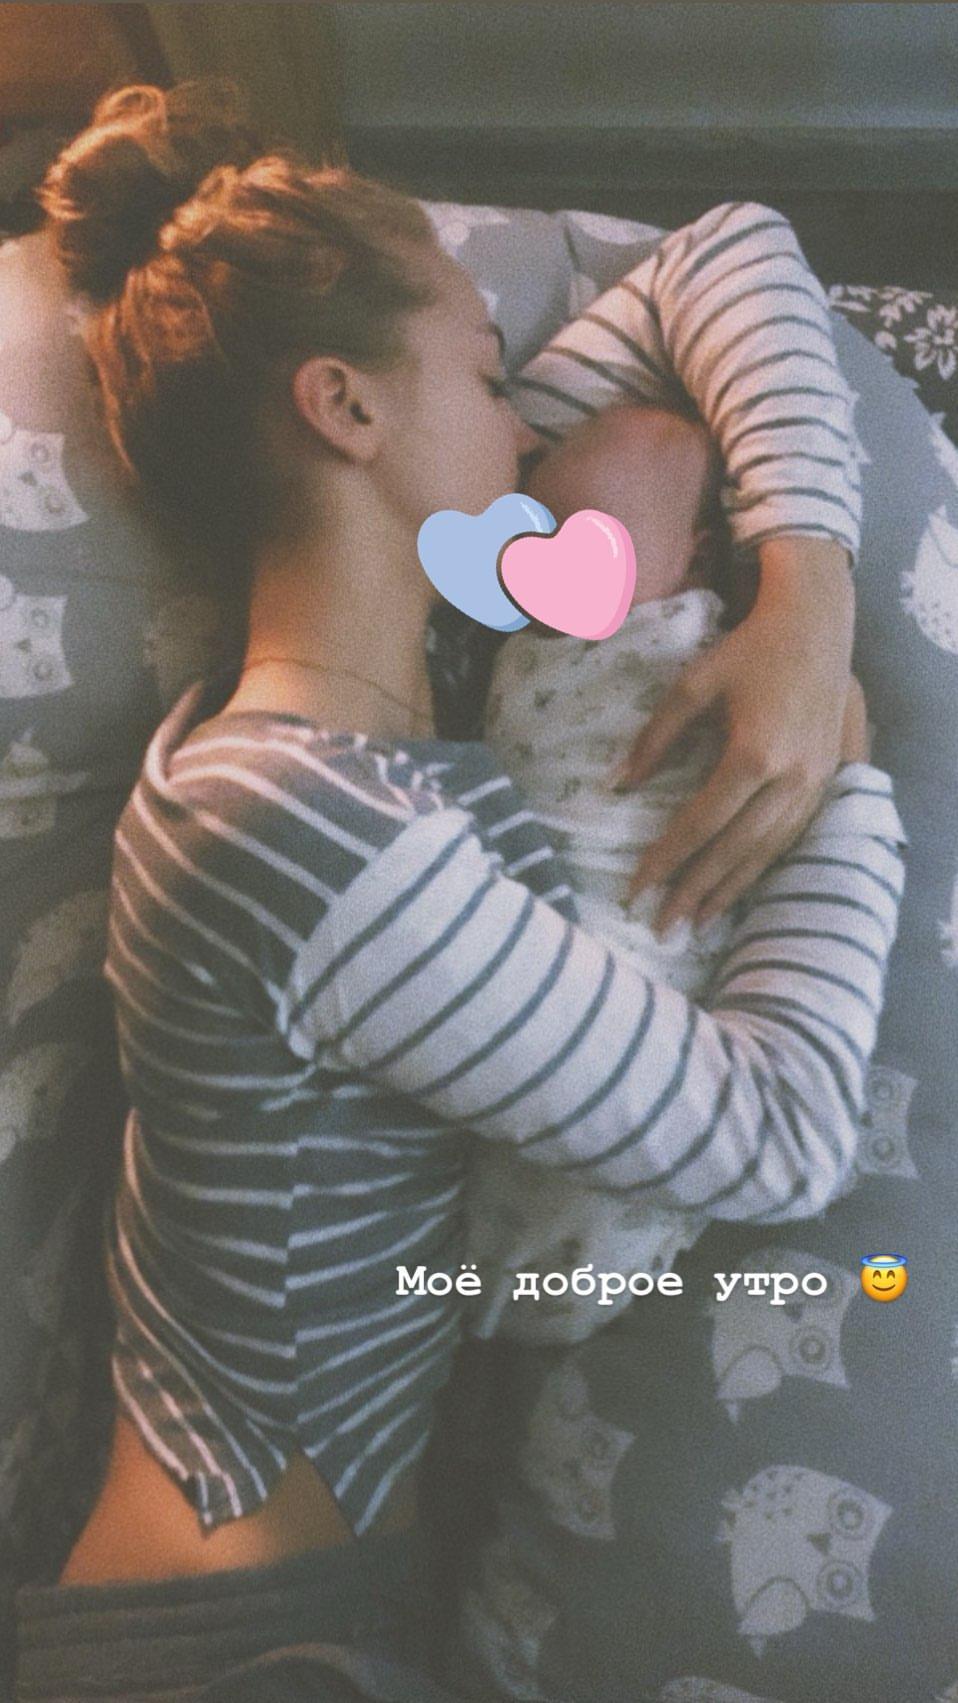 https://i5.imageban.ru/out/2019/05/10/79c4993a9f1c63a621e782f4709efbdc.jpg